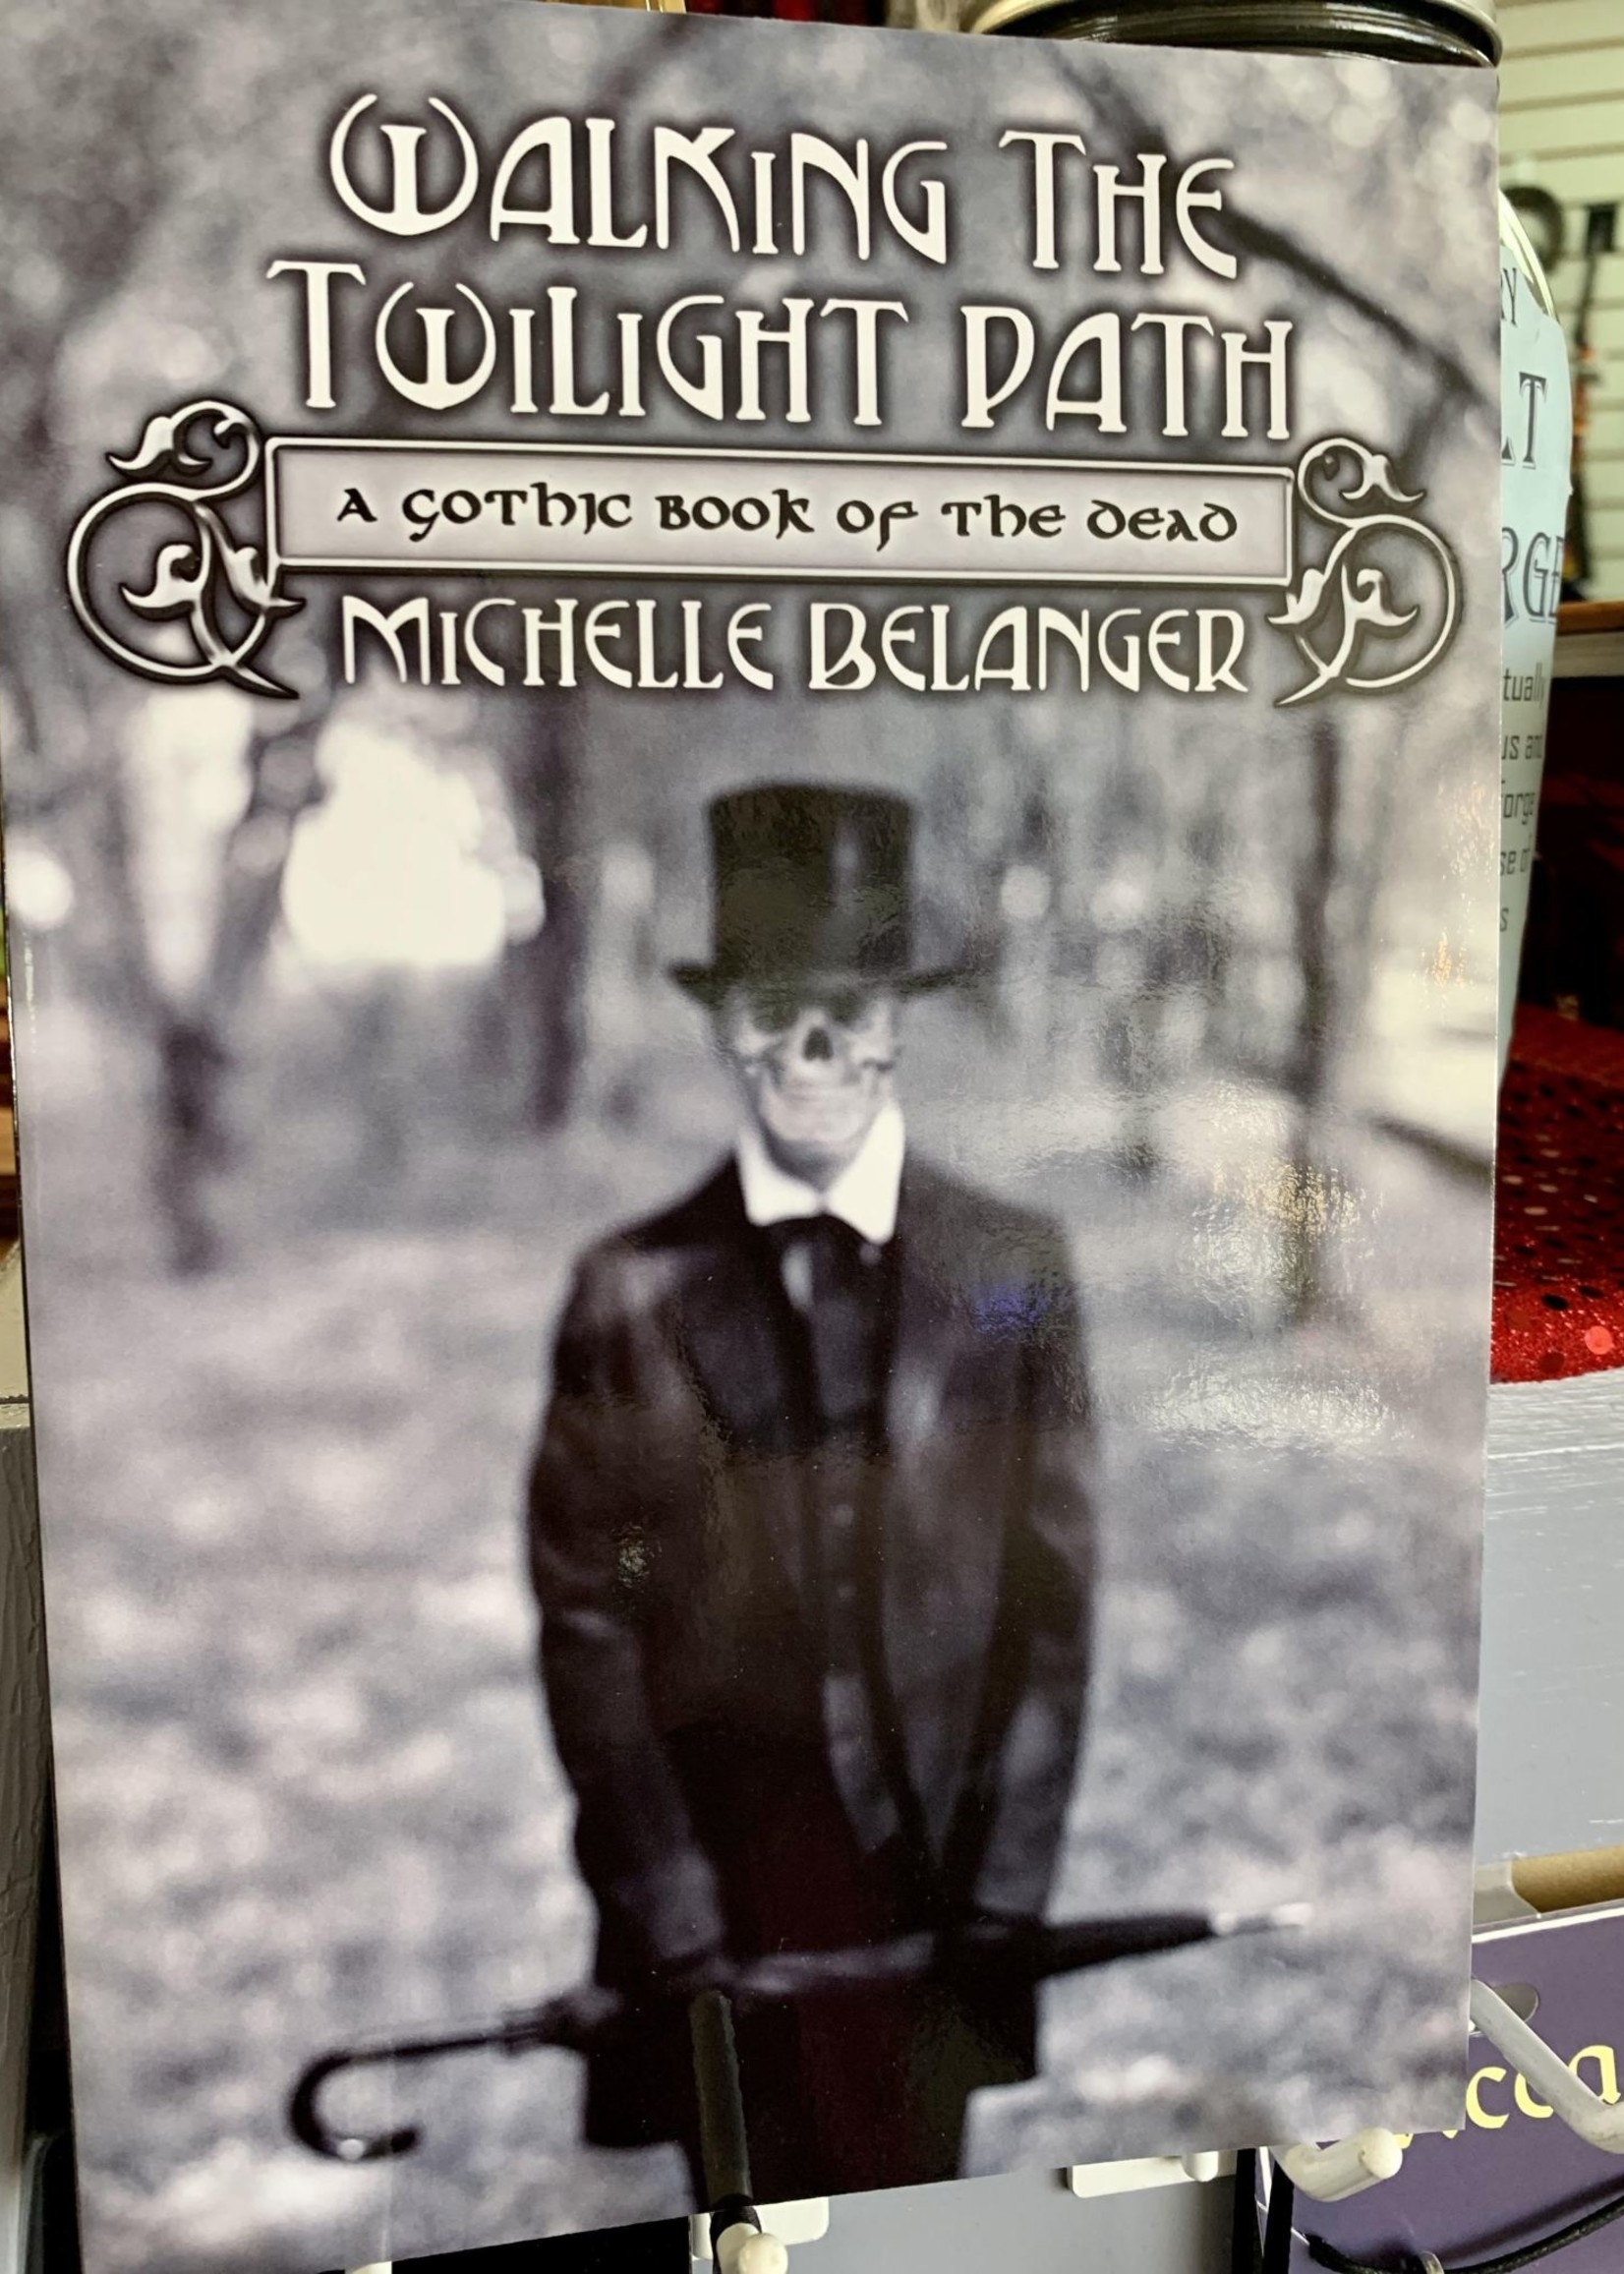 Walking the Twilight Path - Michelle Belanger